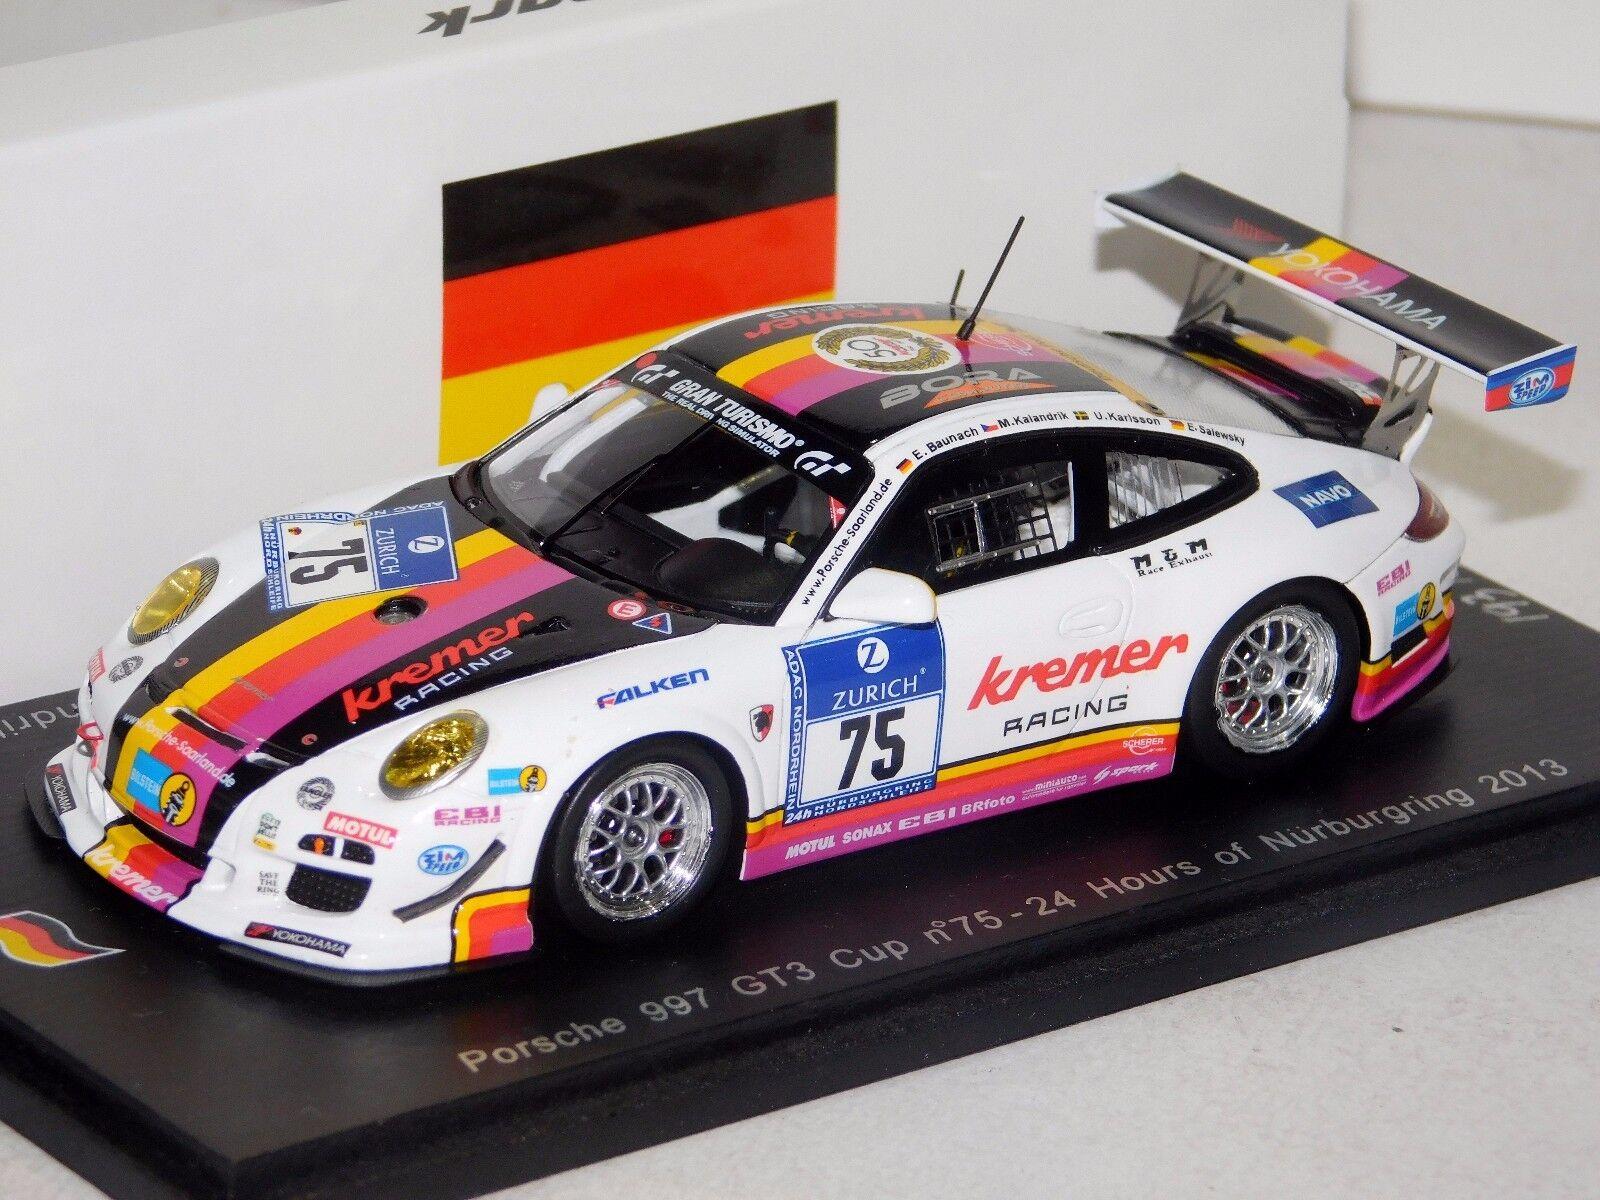 Porsche 997 GT3 Kremer Racing Nurburgring 2013 Spark SG093 1 43